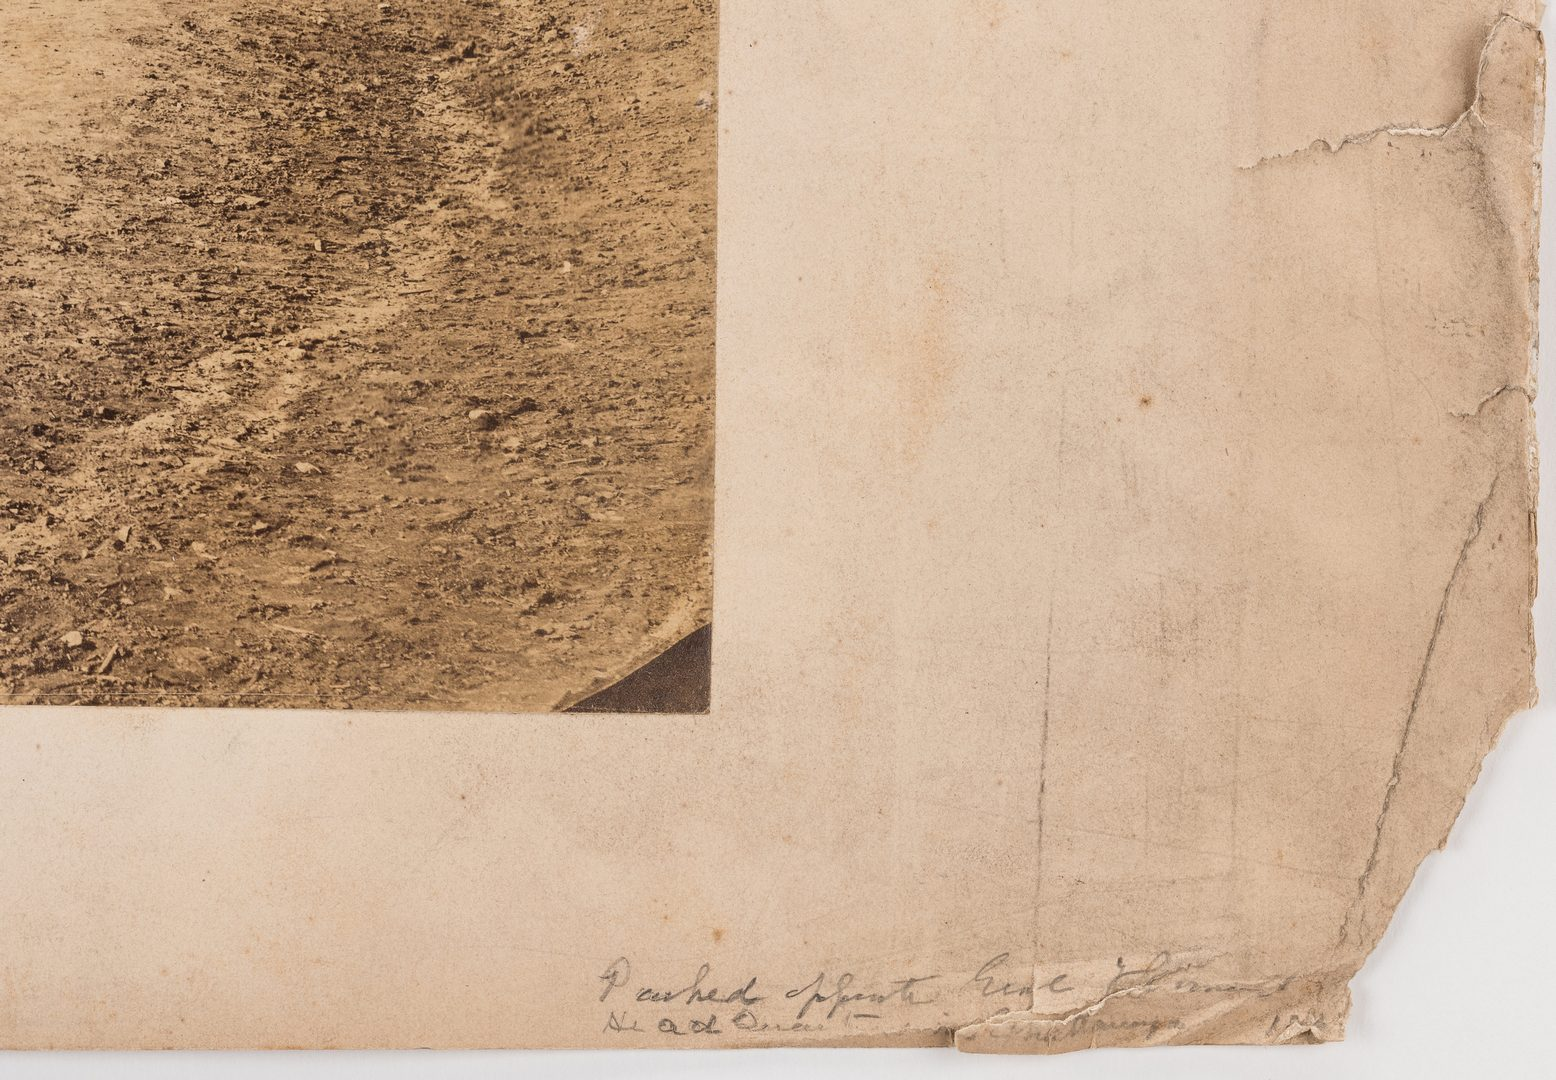 Lot 518: Civil War Photograph, Battle of Chattanooga